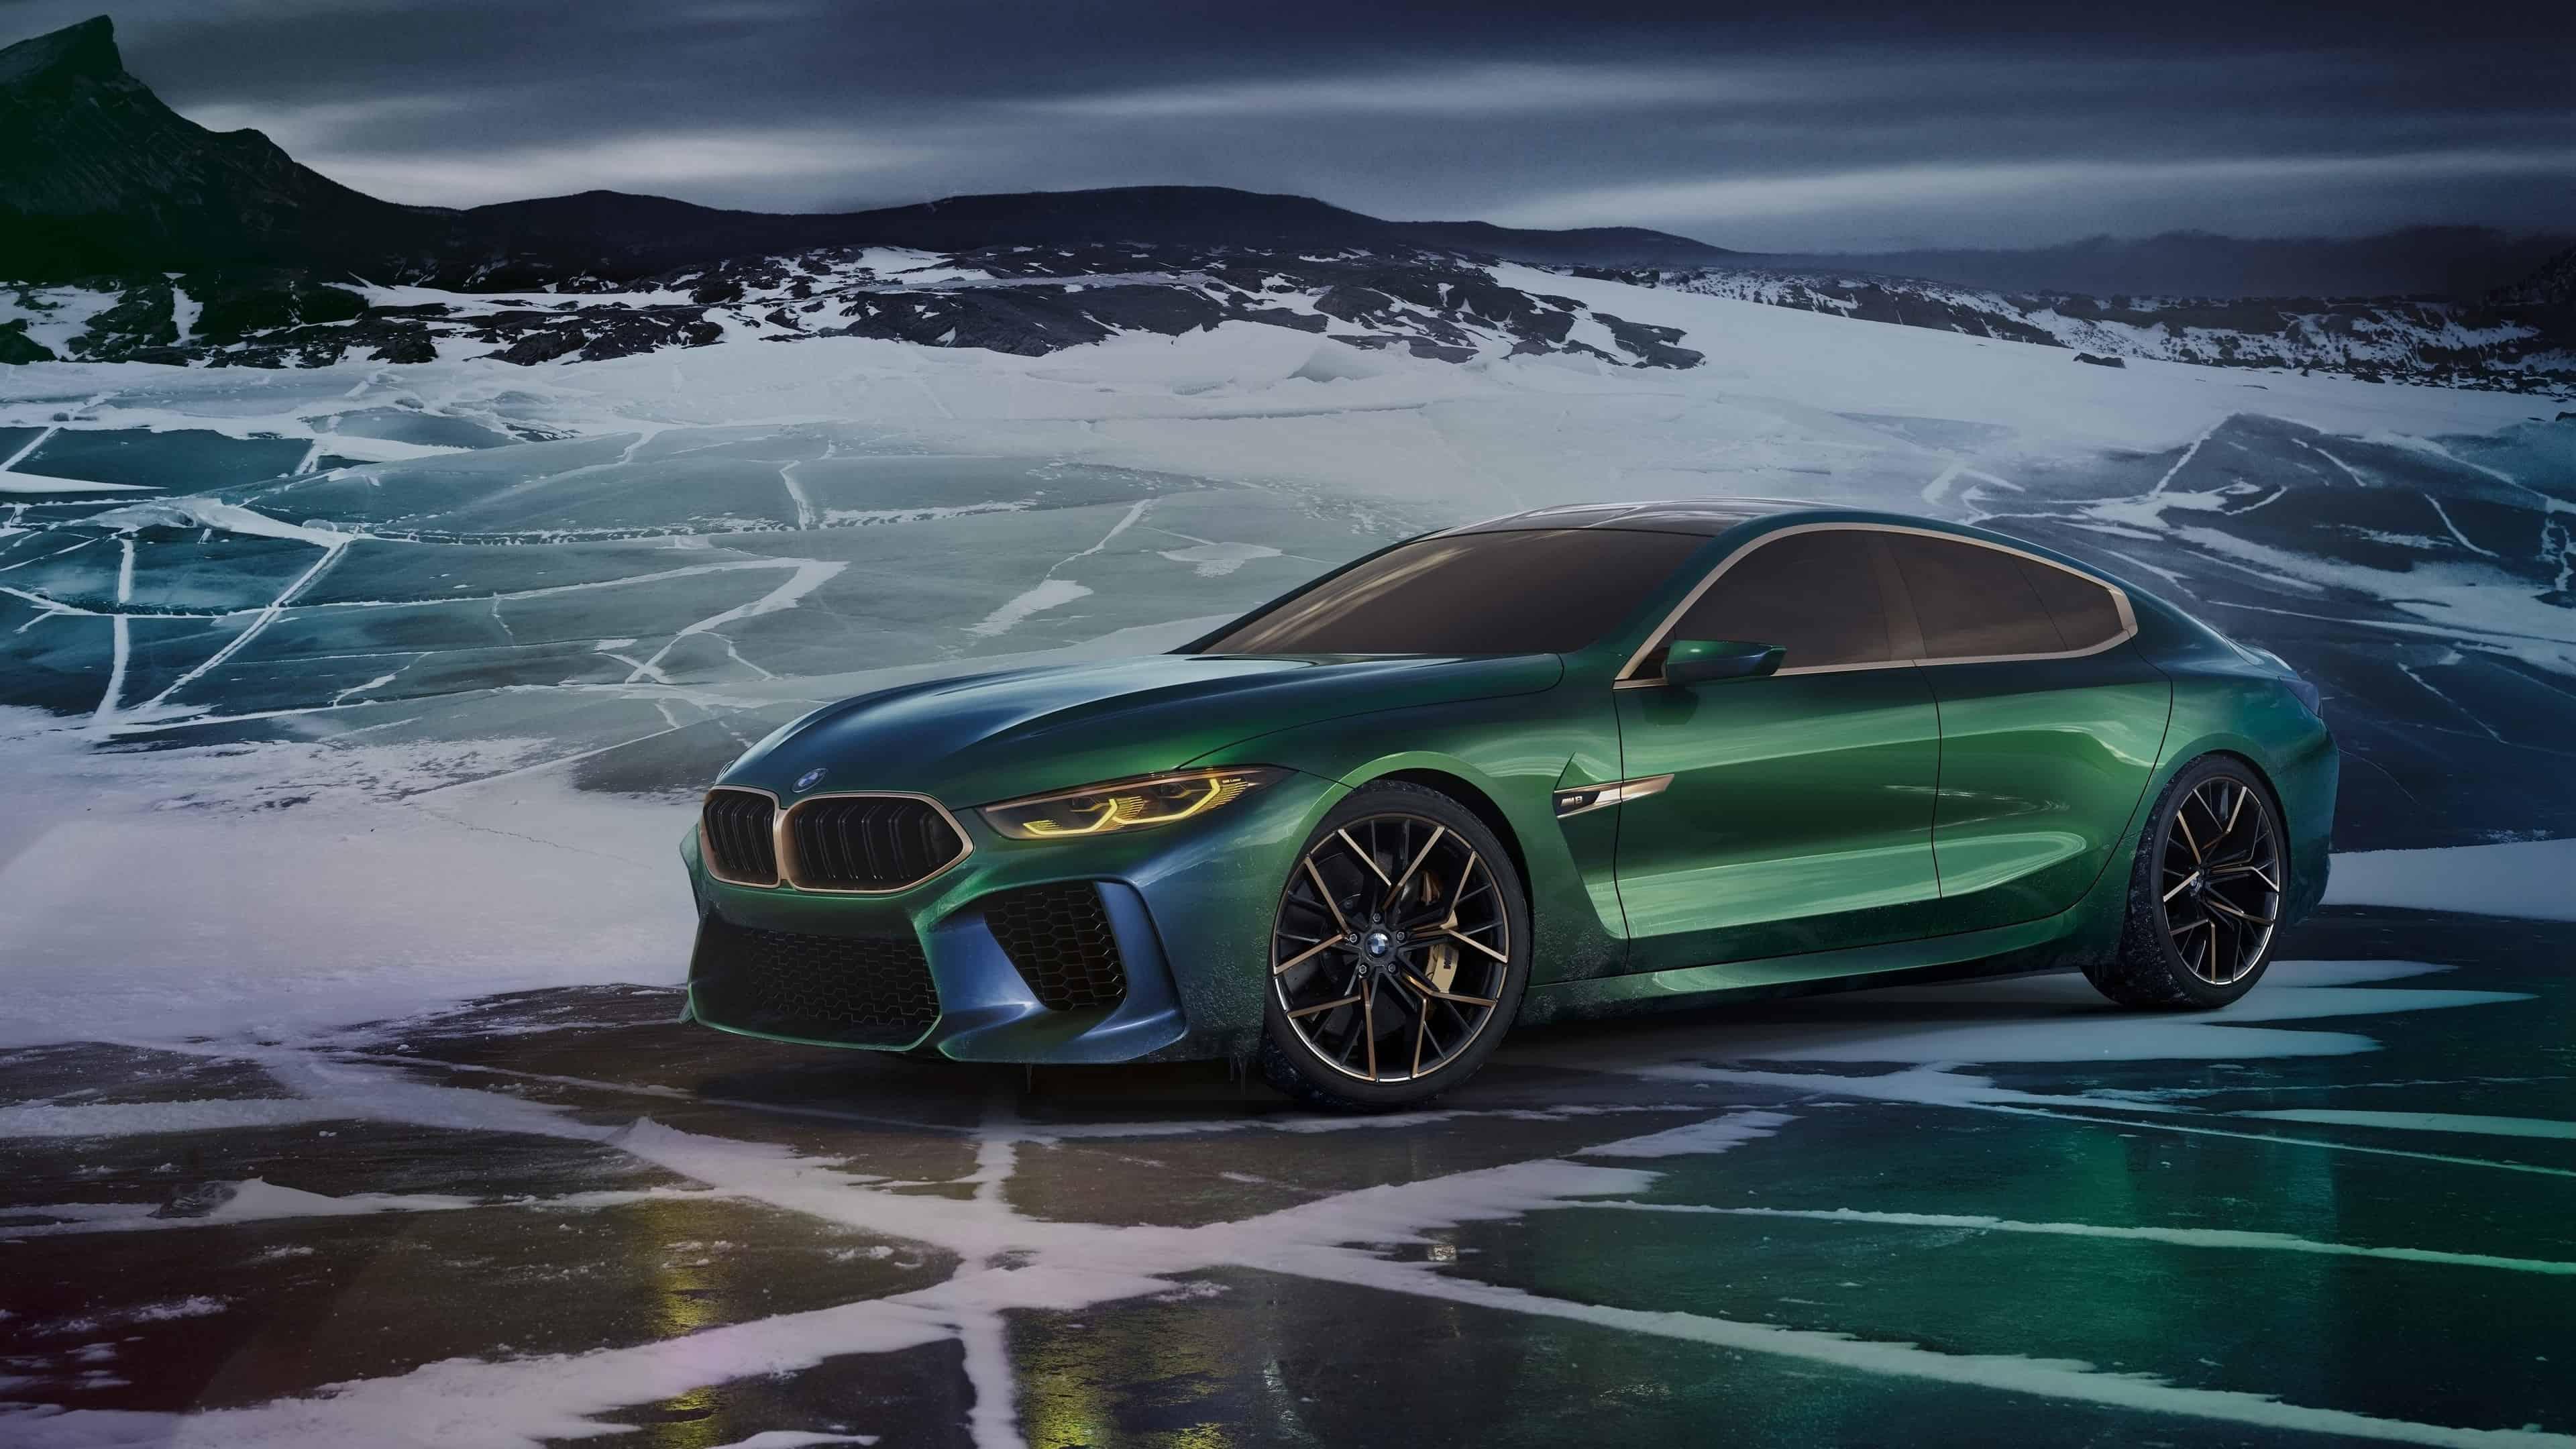 Cars Hd Mobile Wallpapers Bmw M8 Gran Coupe Concept Green Uhd 4k Wallpaper Pixelz